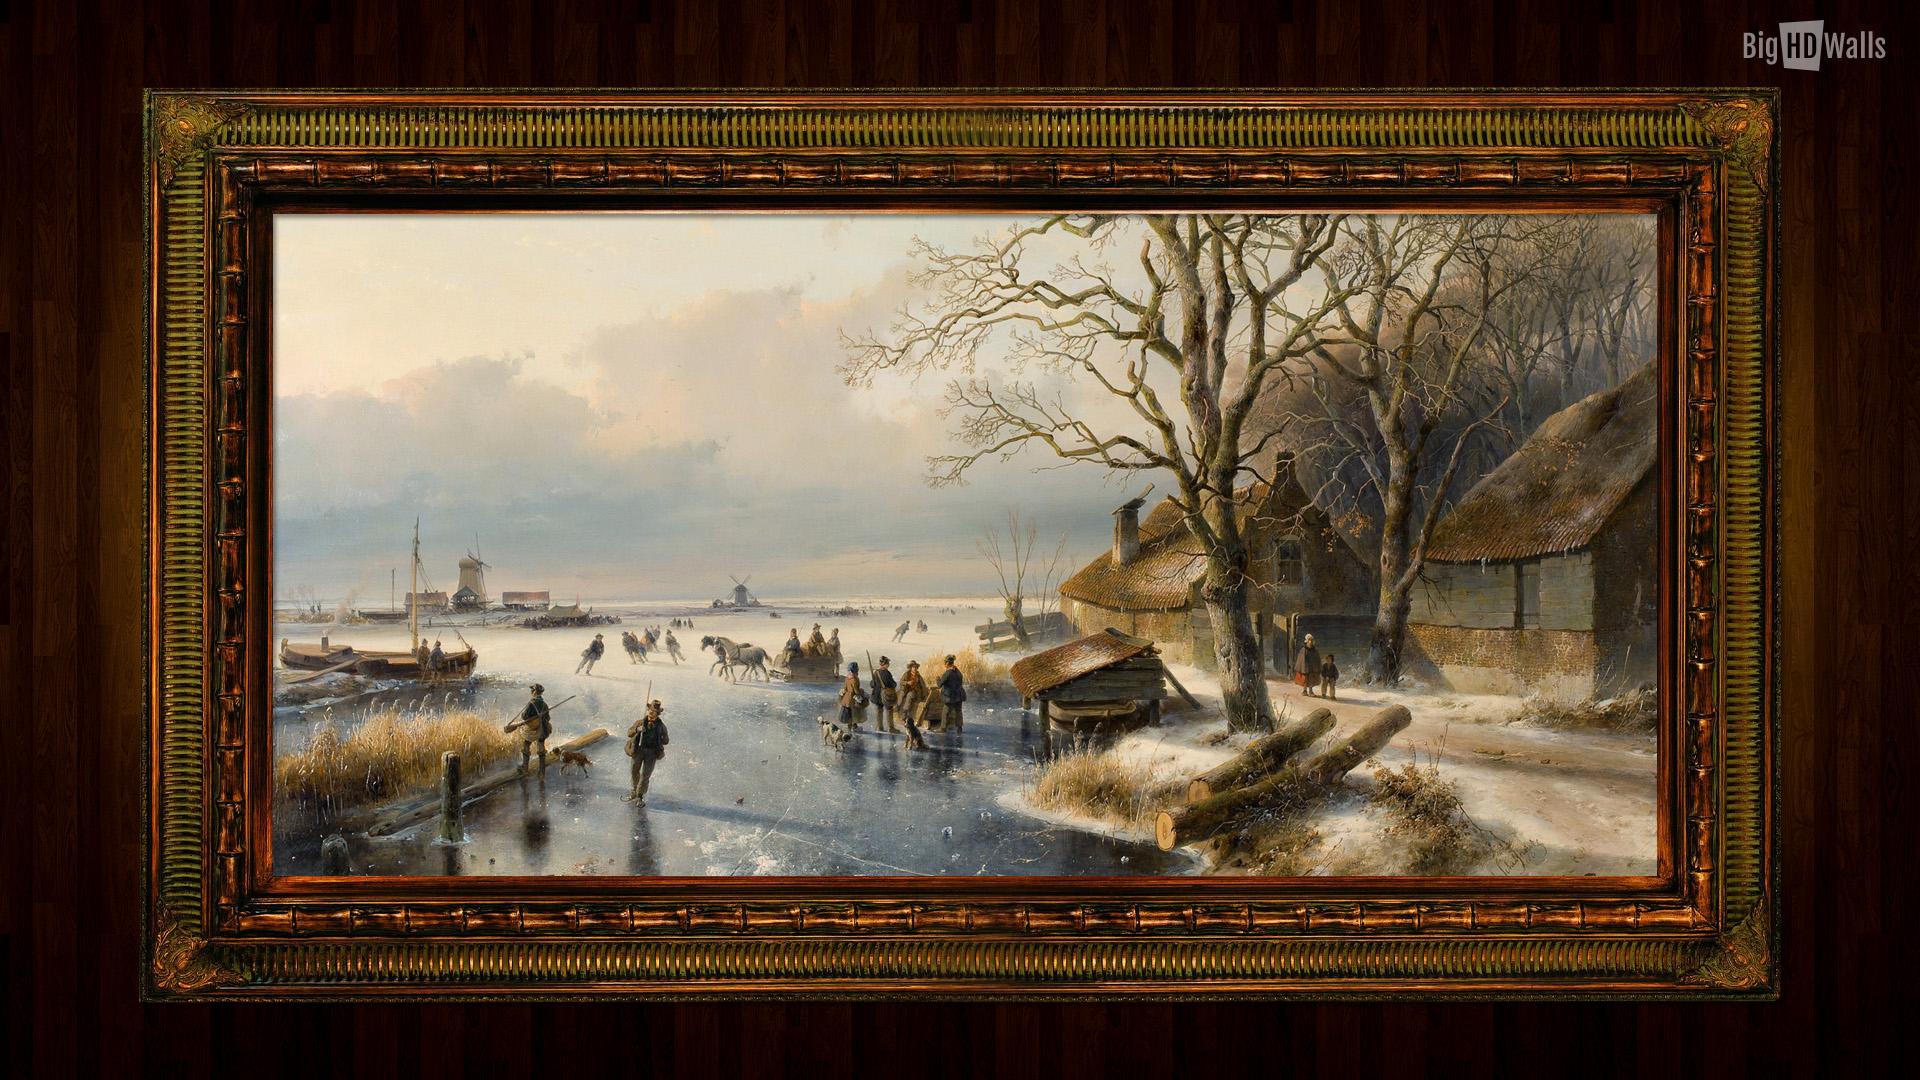 andreas schelfout painting hd wallpaper010 1920x1080